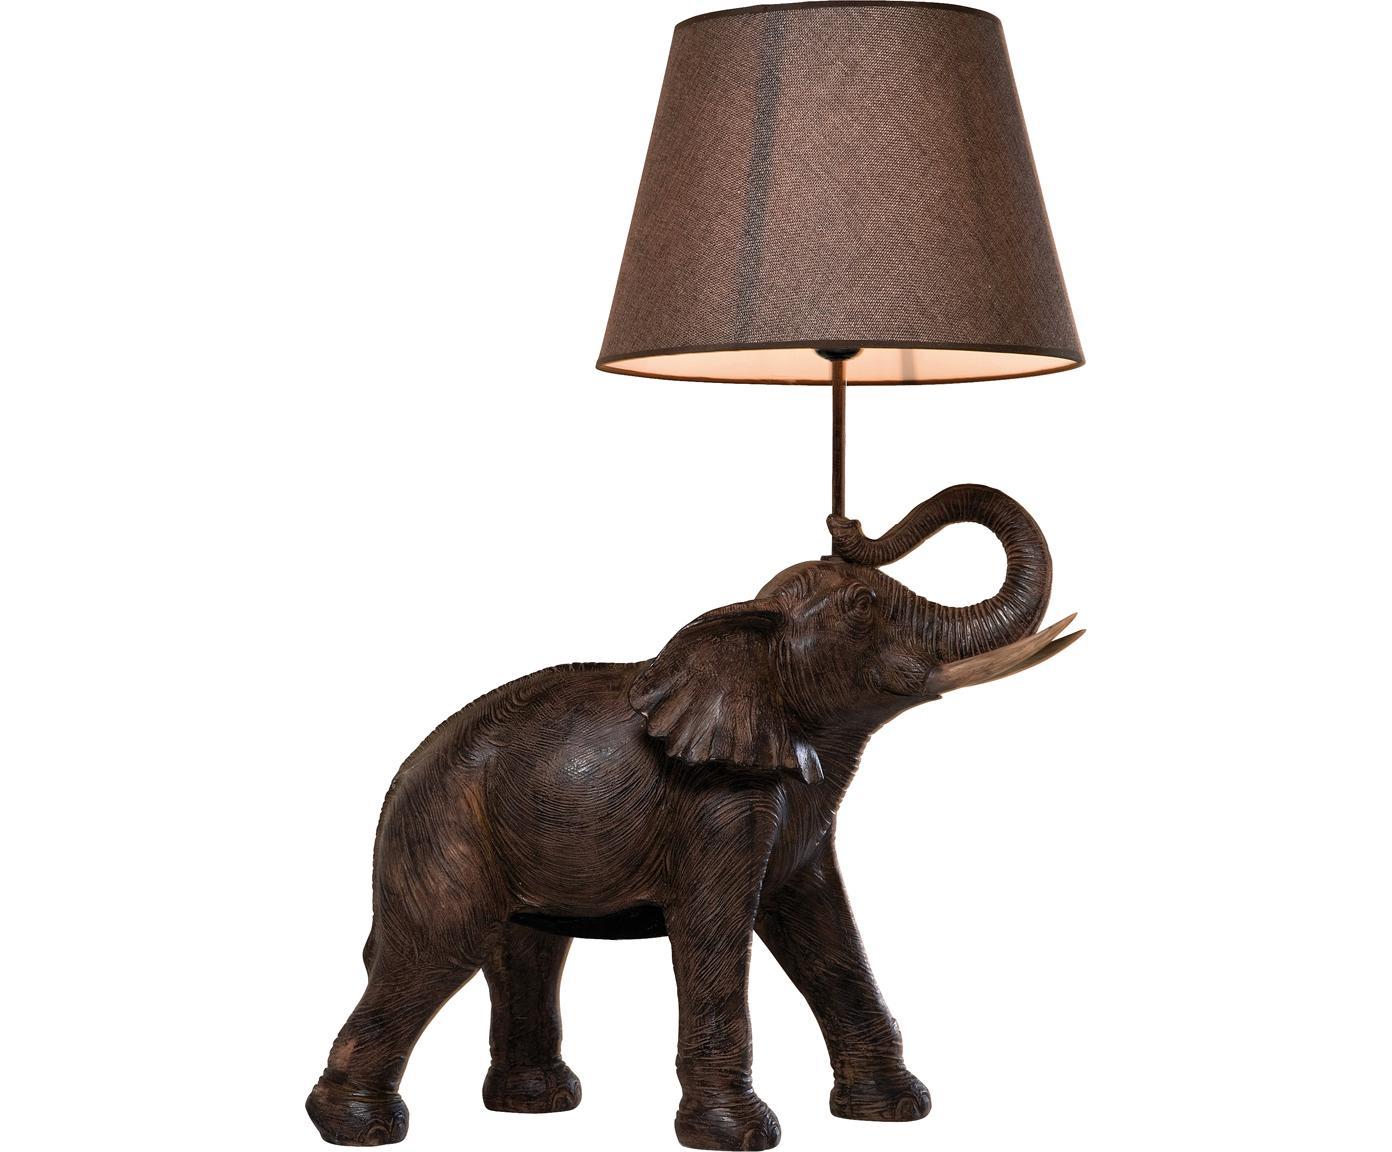 Lámpara de mesa Elephant, Pantalla: lino, Cable: plástico, Gris pardo, marrón, An 52 x Al 74 cm